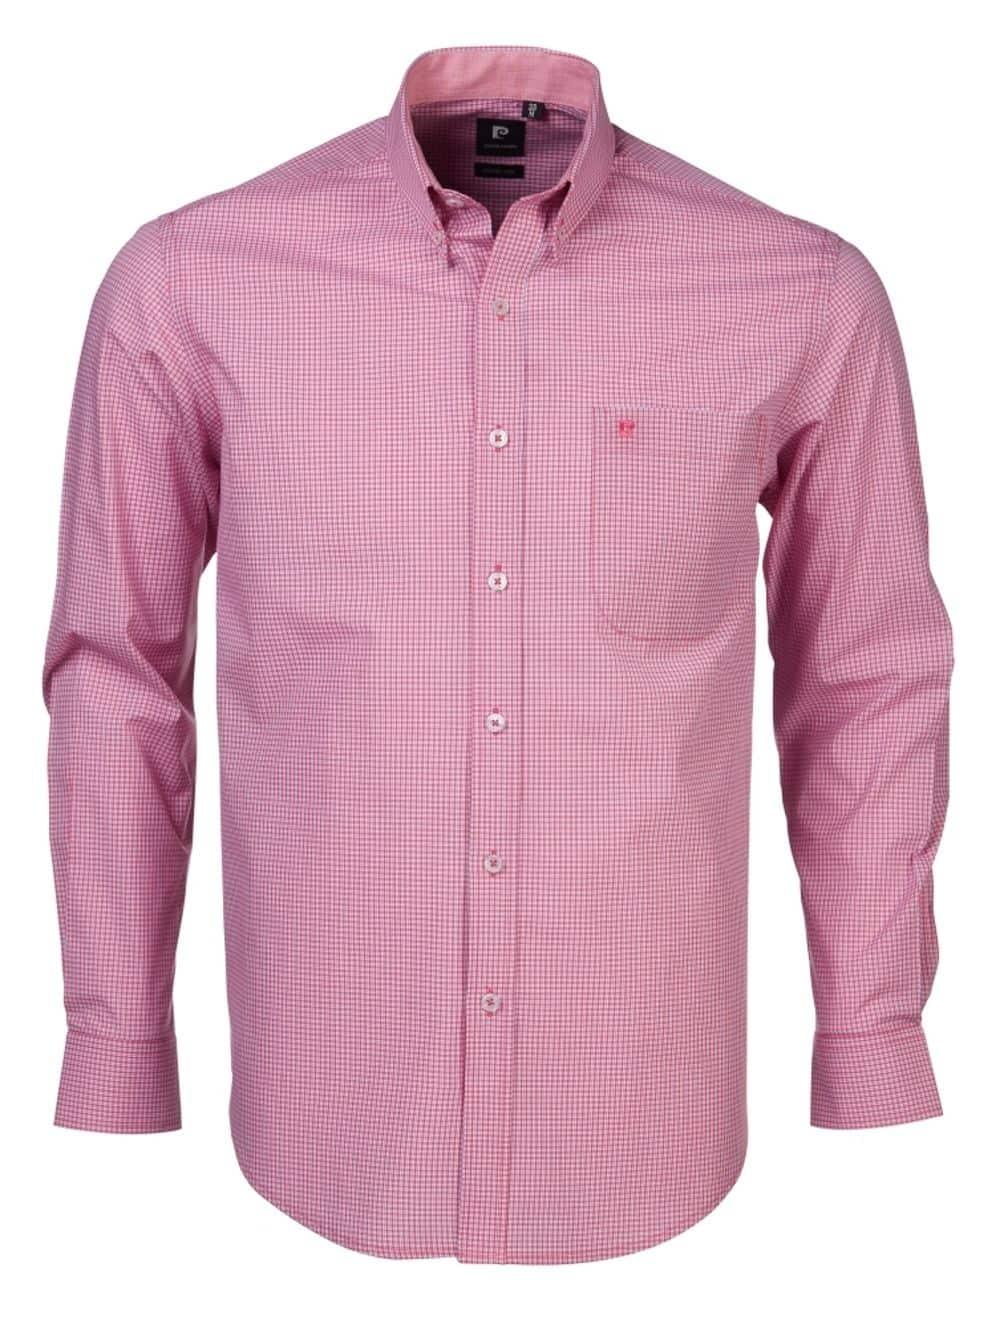 Mens Slimfit PC5 Shirt Lounge Shirts and Blouses